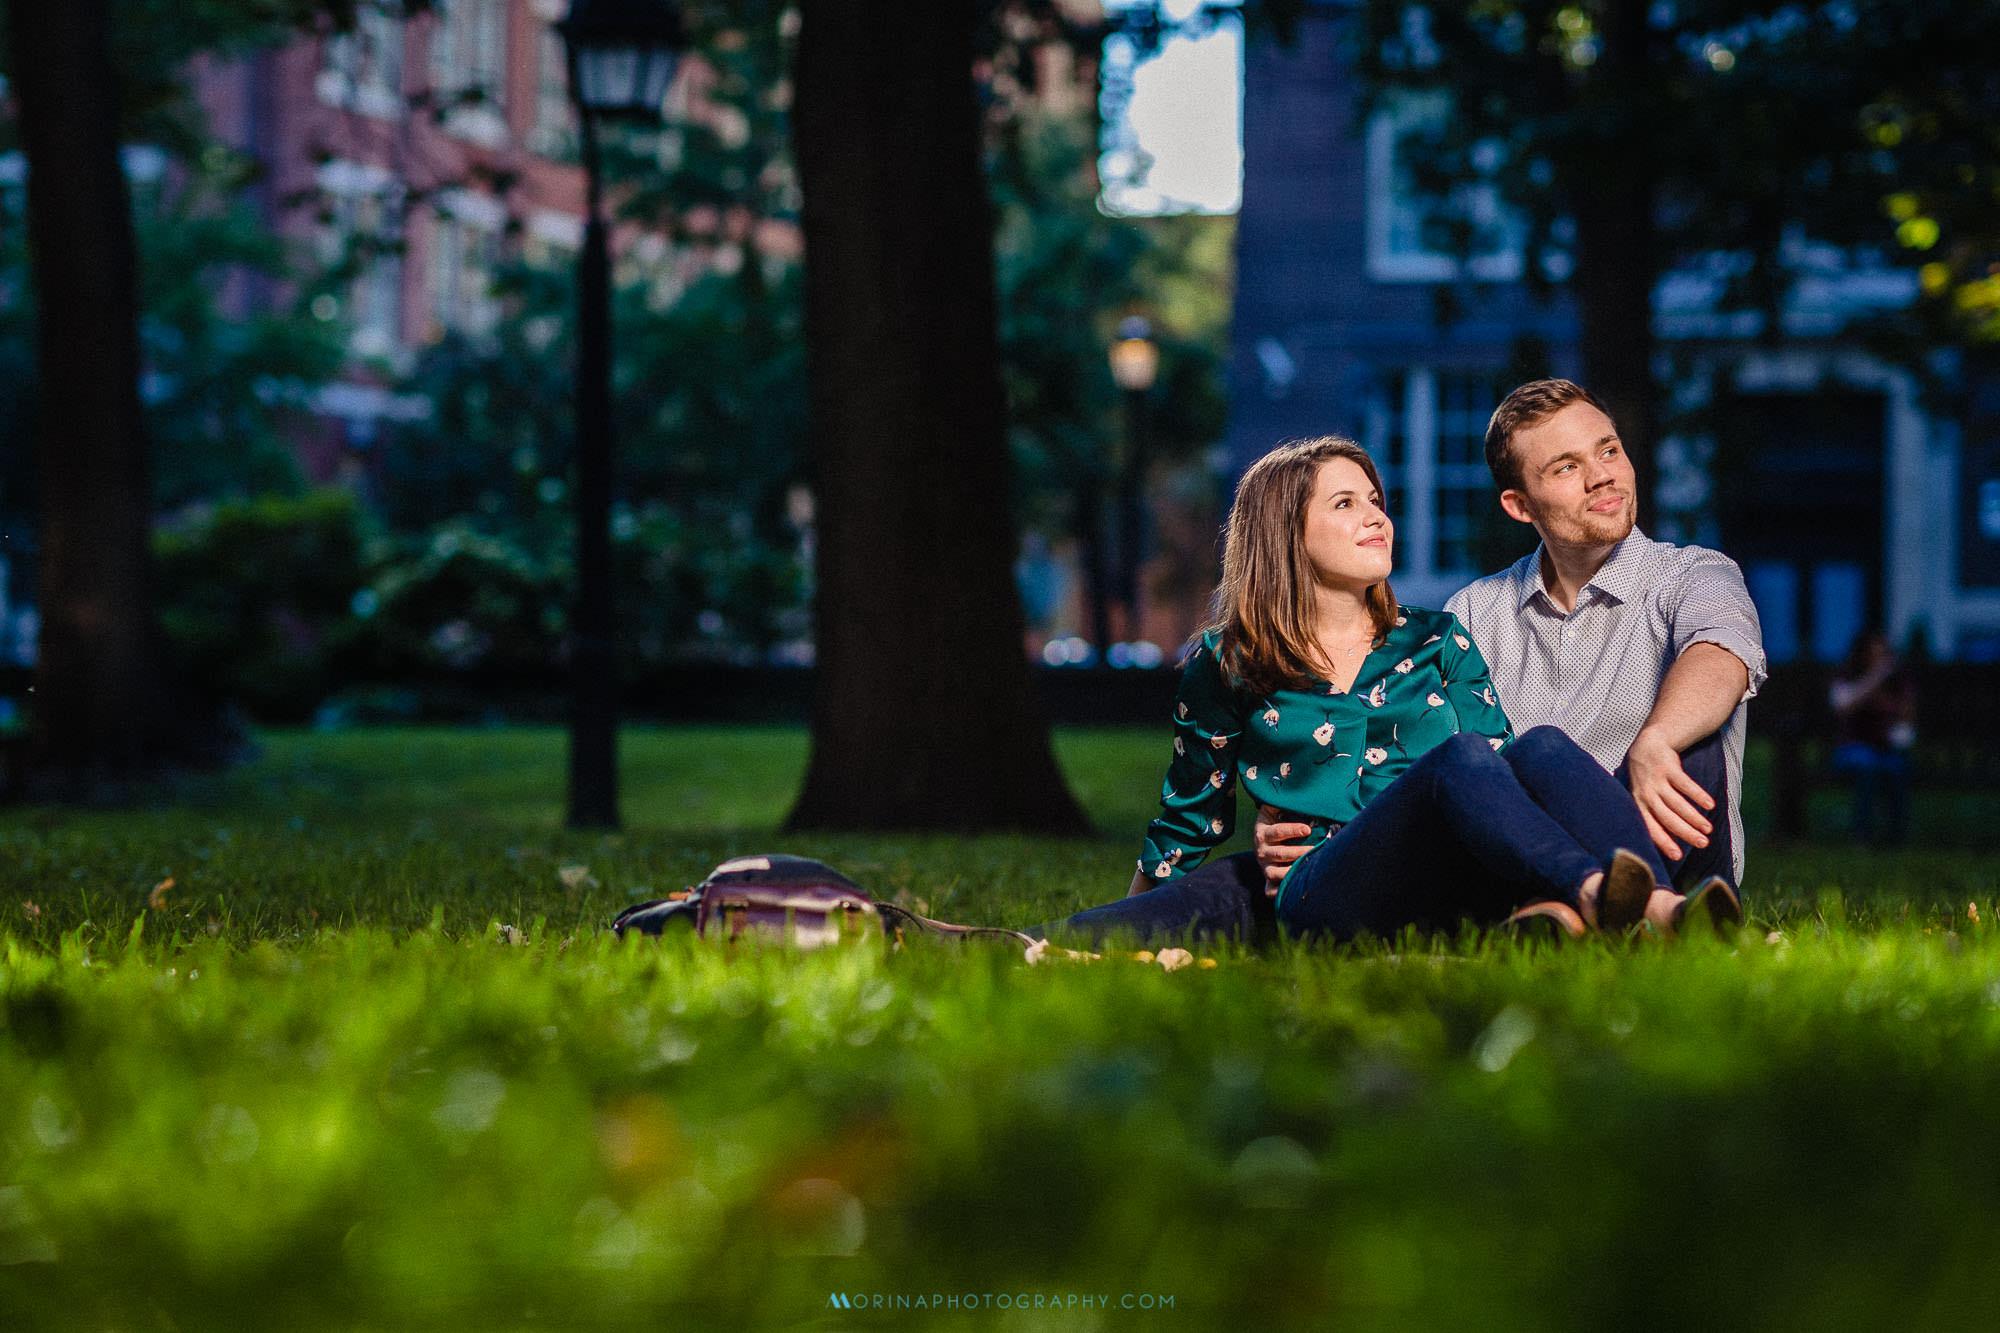 Brittany & Cameron 0002.jpg